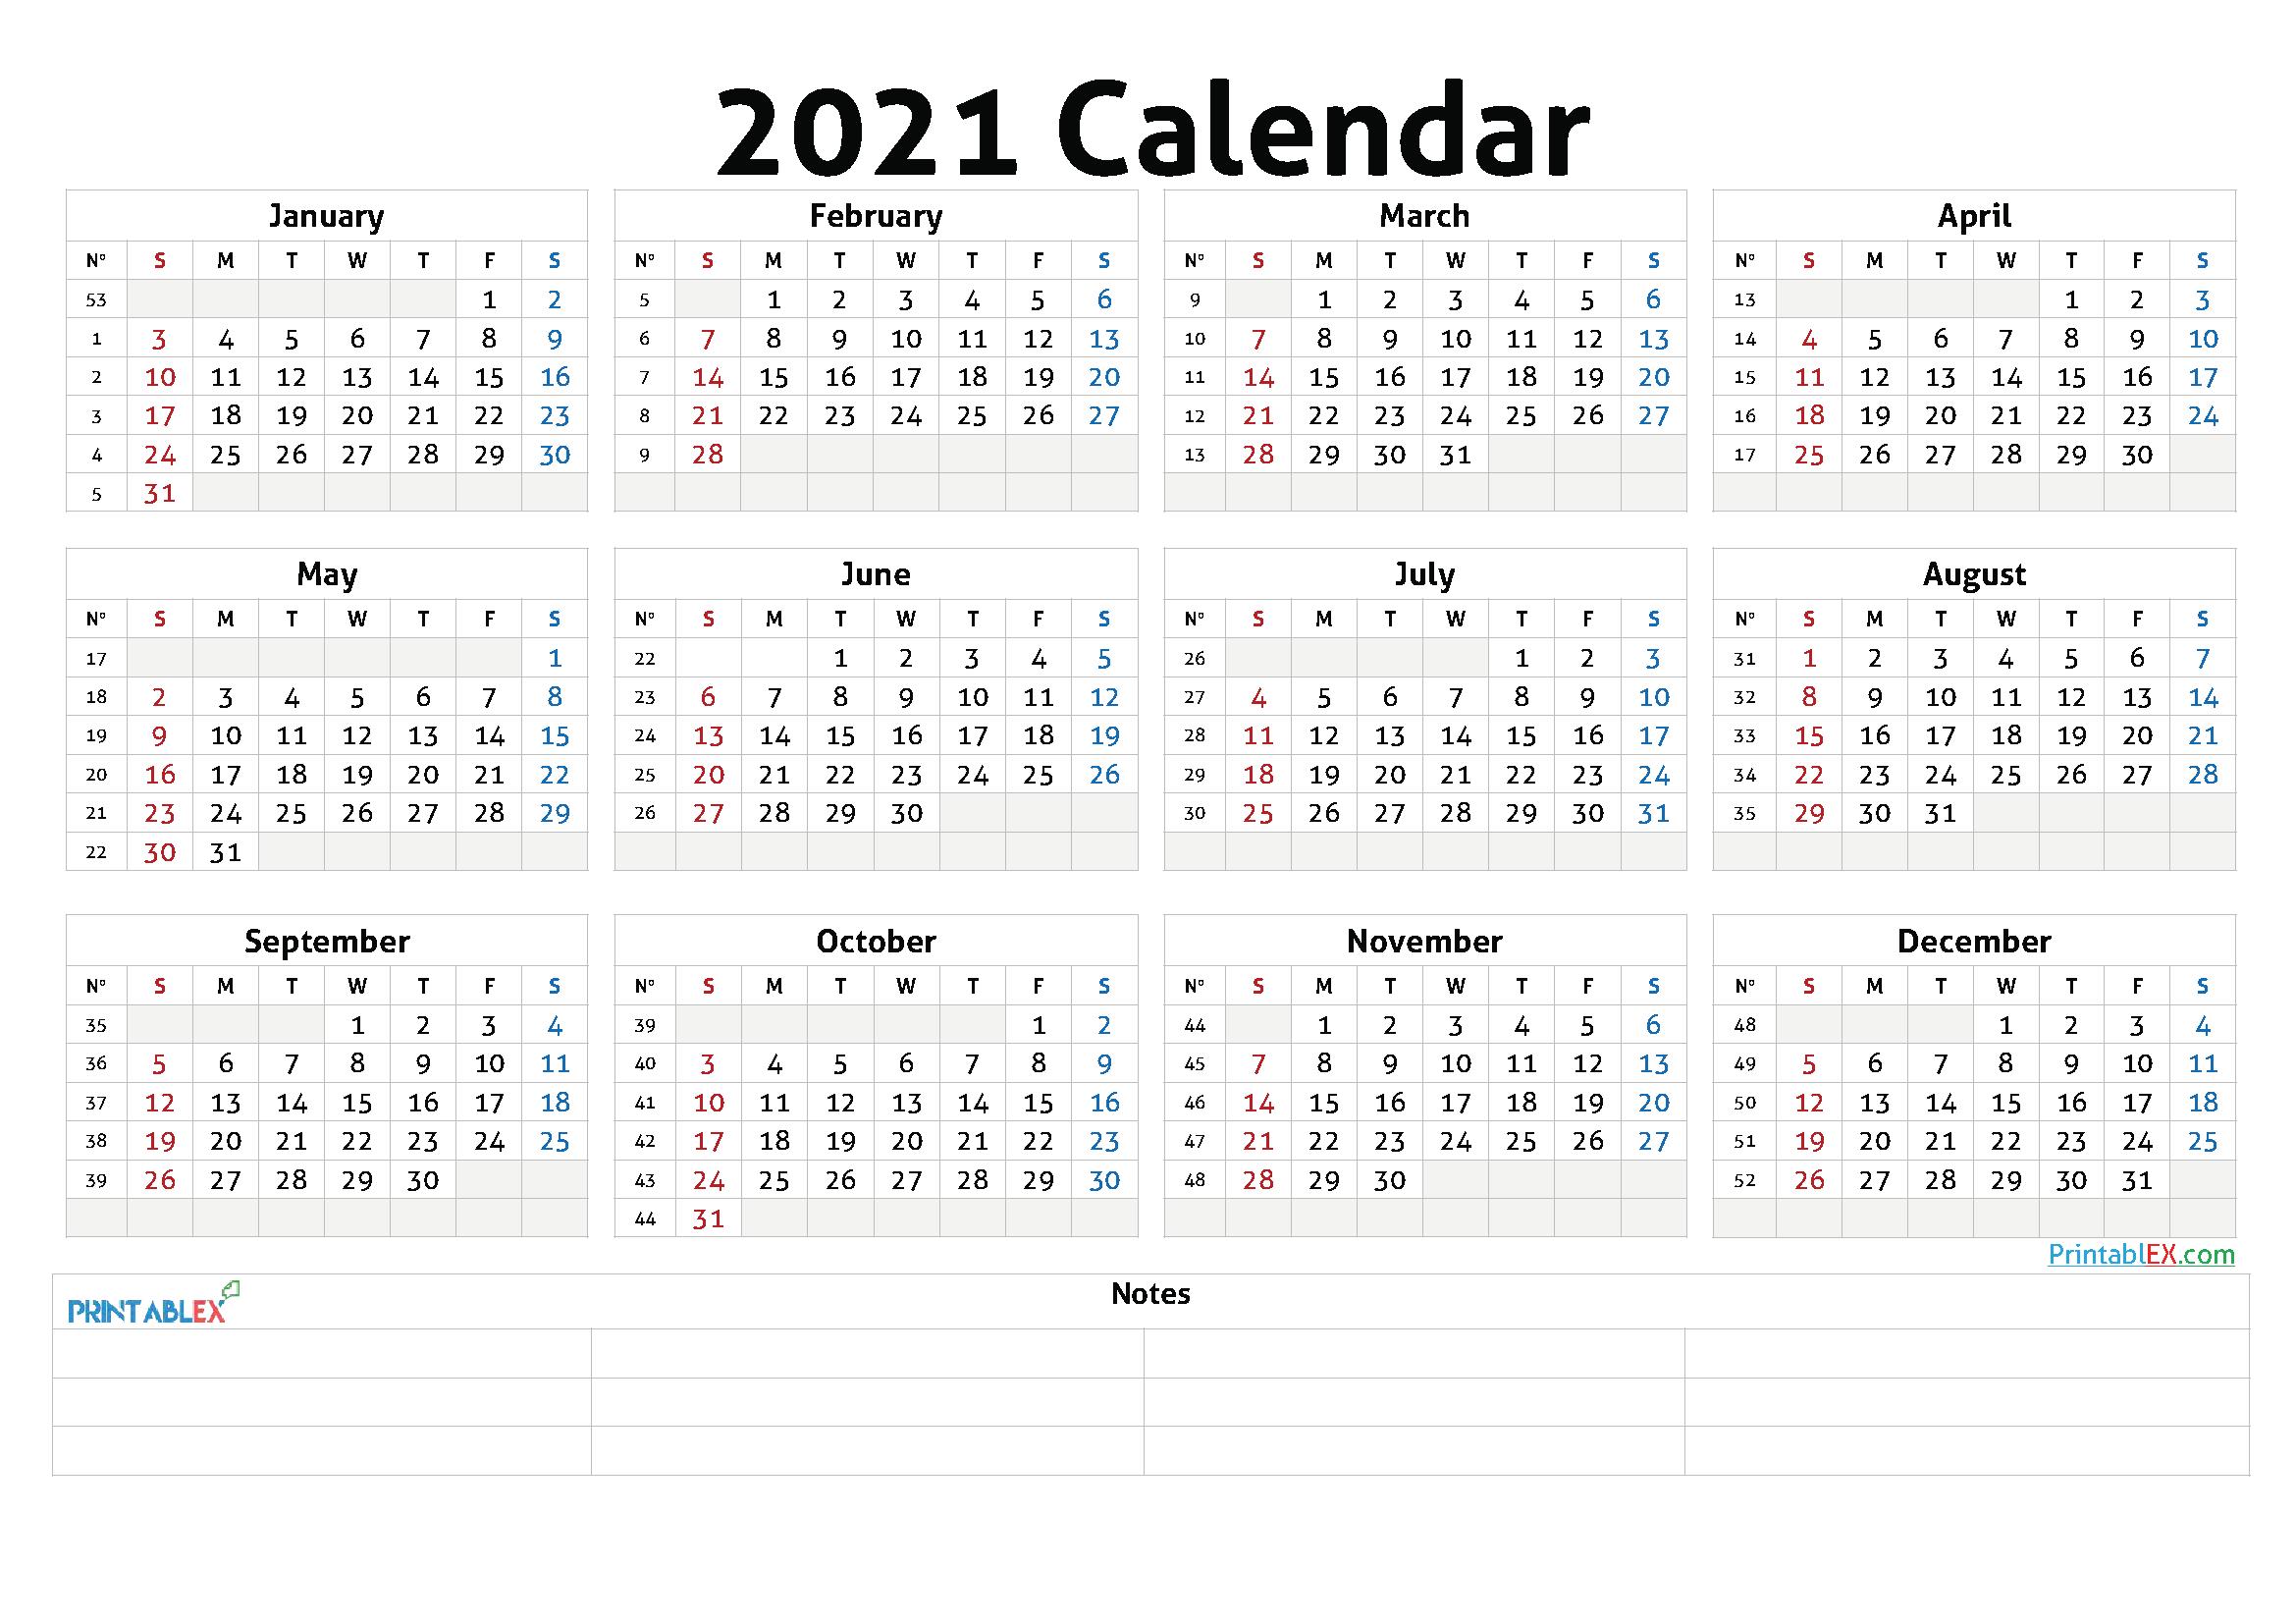 2021 Annual Calendar Printable - 21Ytw47-Calendar Template 2021 Printable Free